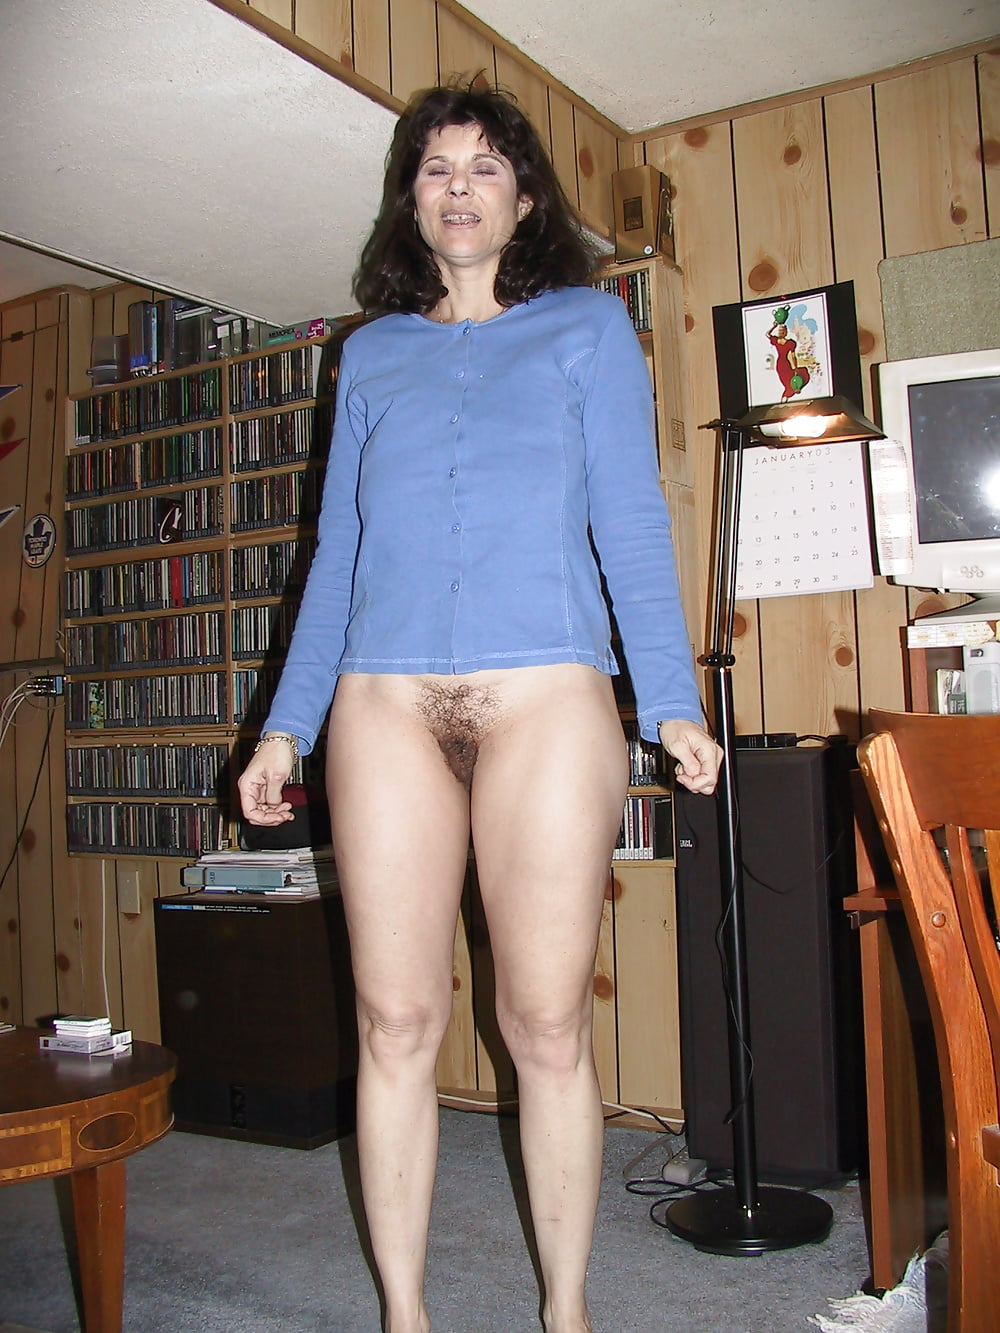 mom-amateurs-bottomless-naked-porn-pin-ups